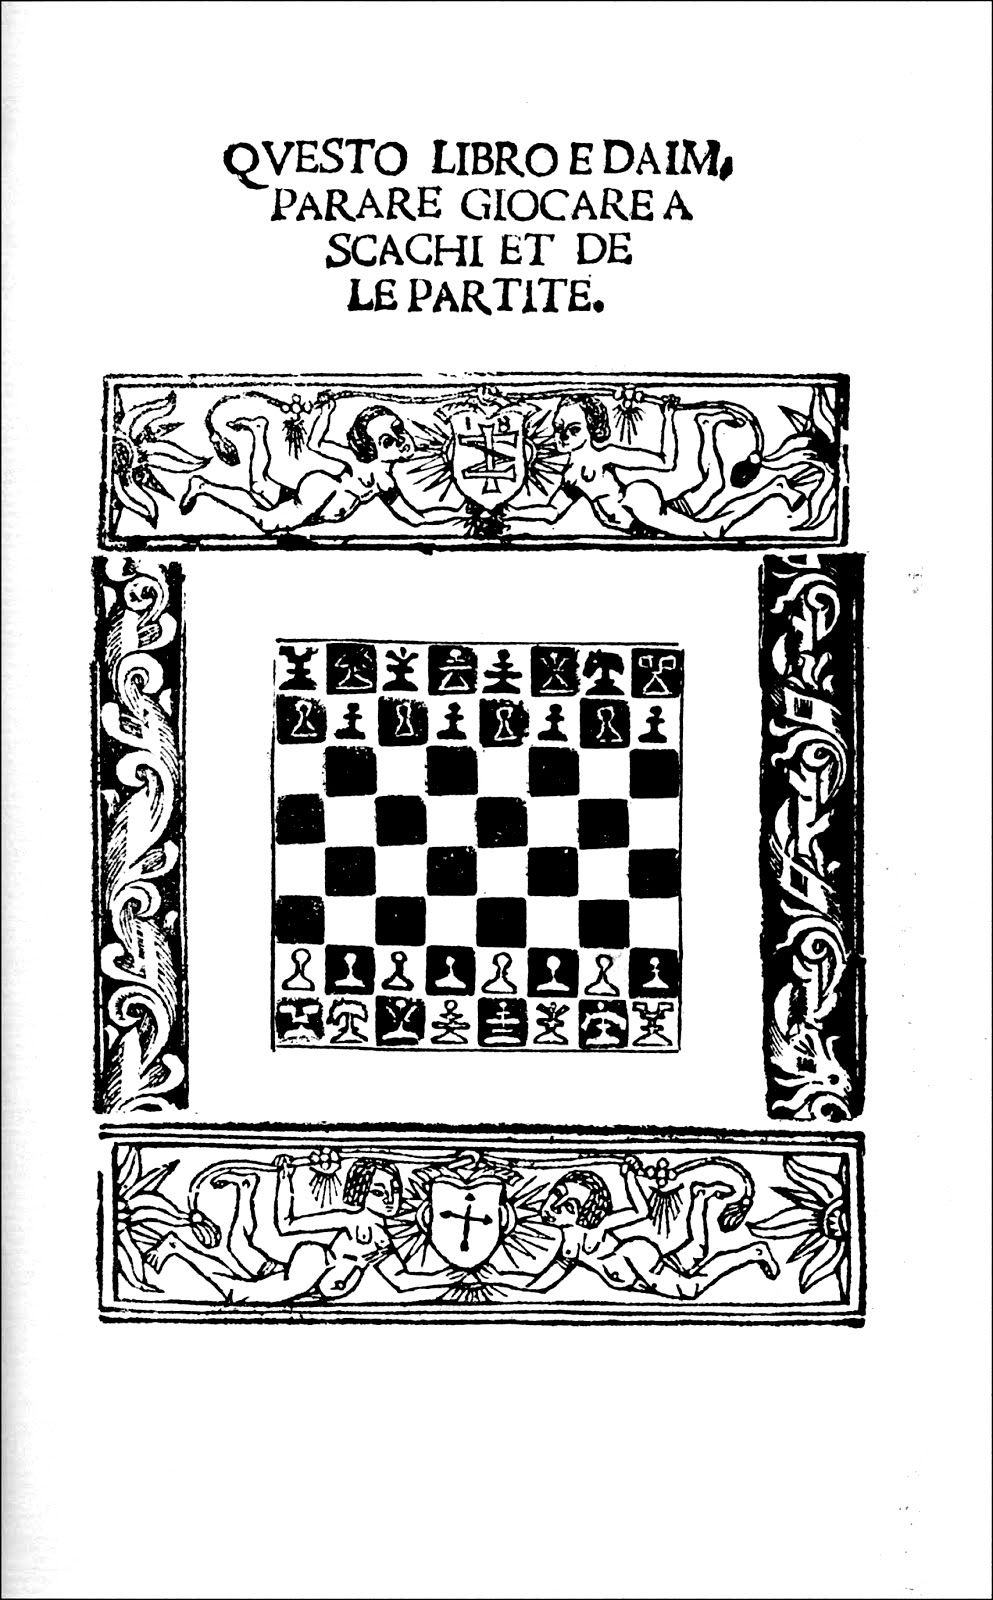 The Damiano chess set